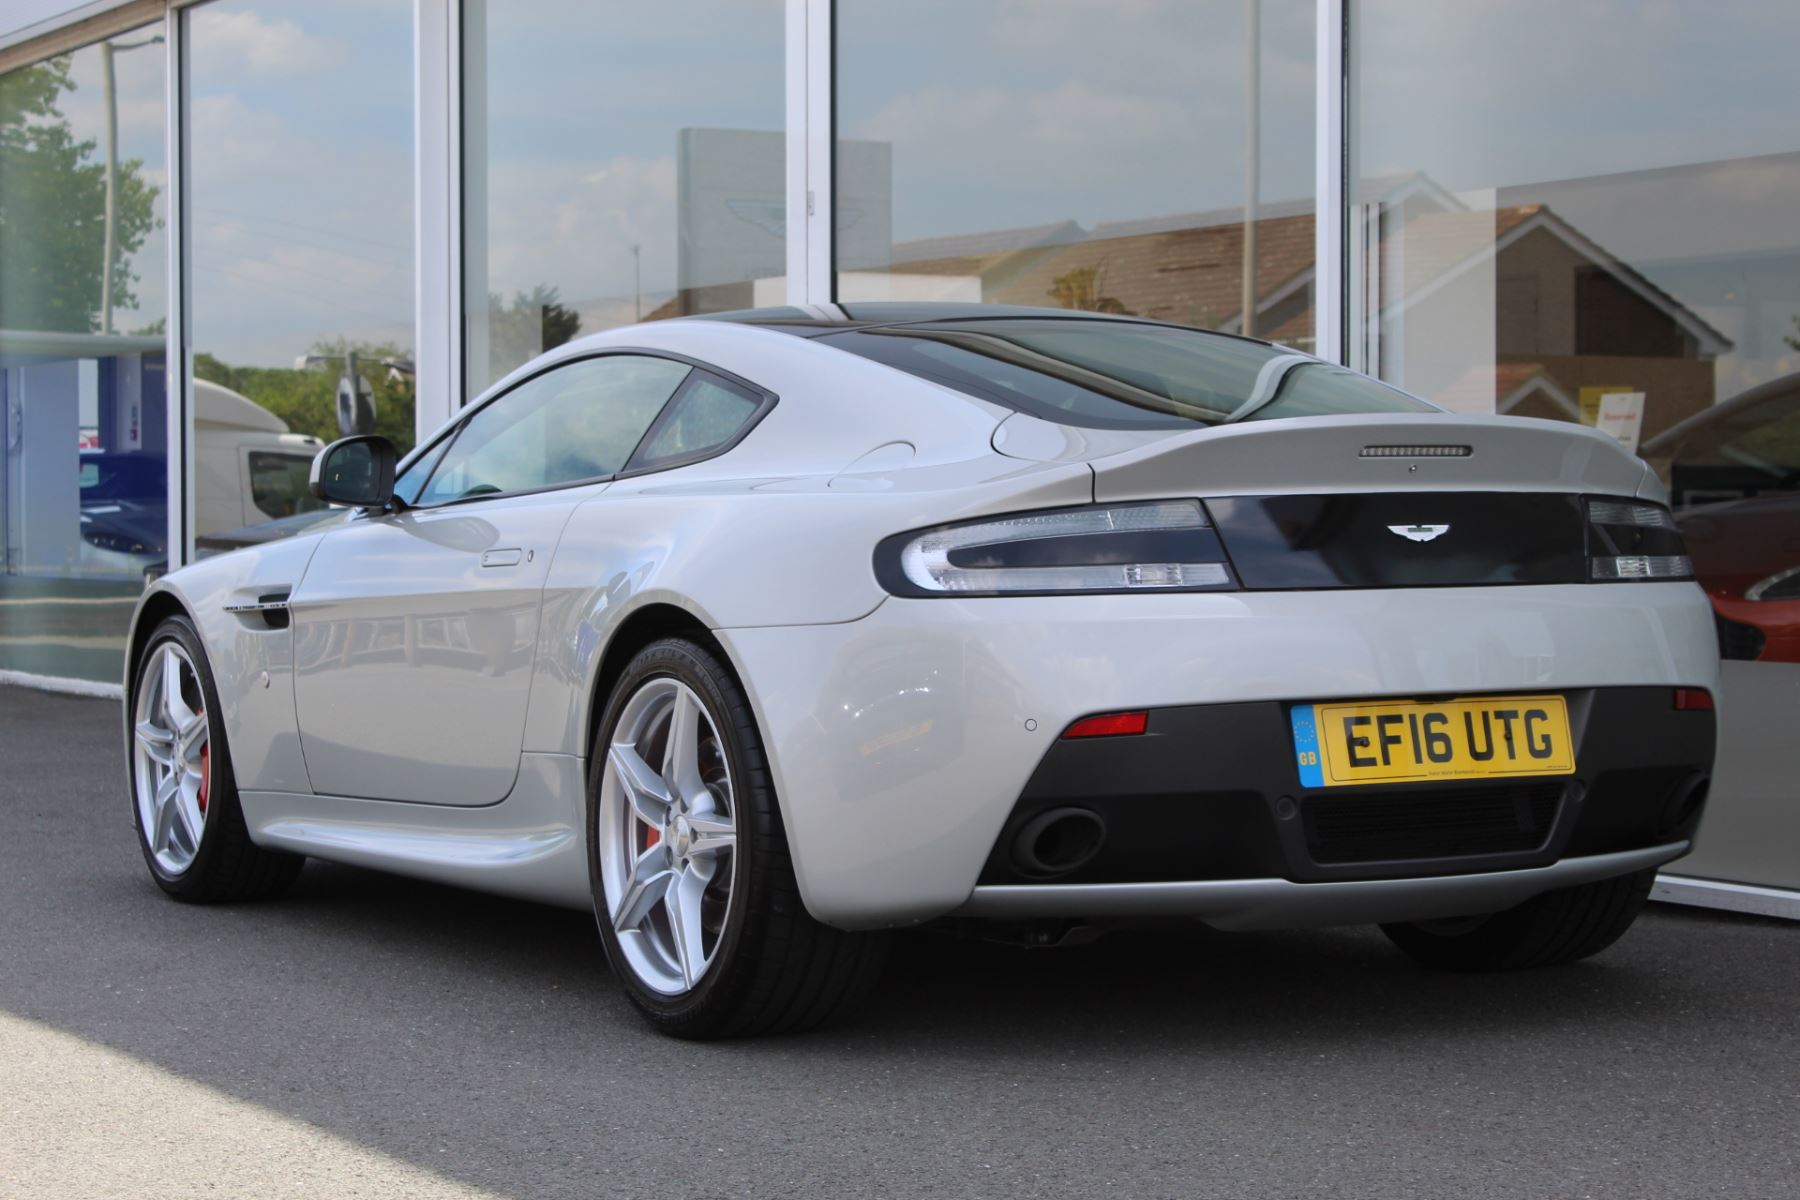 Aston Martin V8 Vantage Coupe 2dr [420] Latest Dash, 420BHP image 13